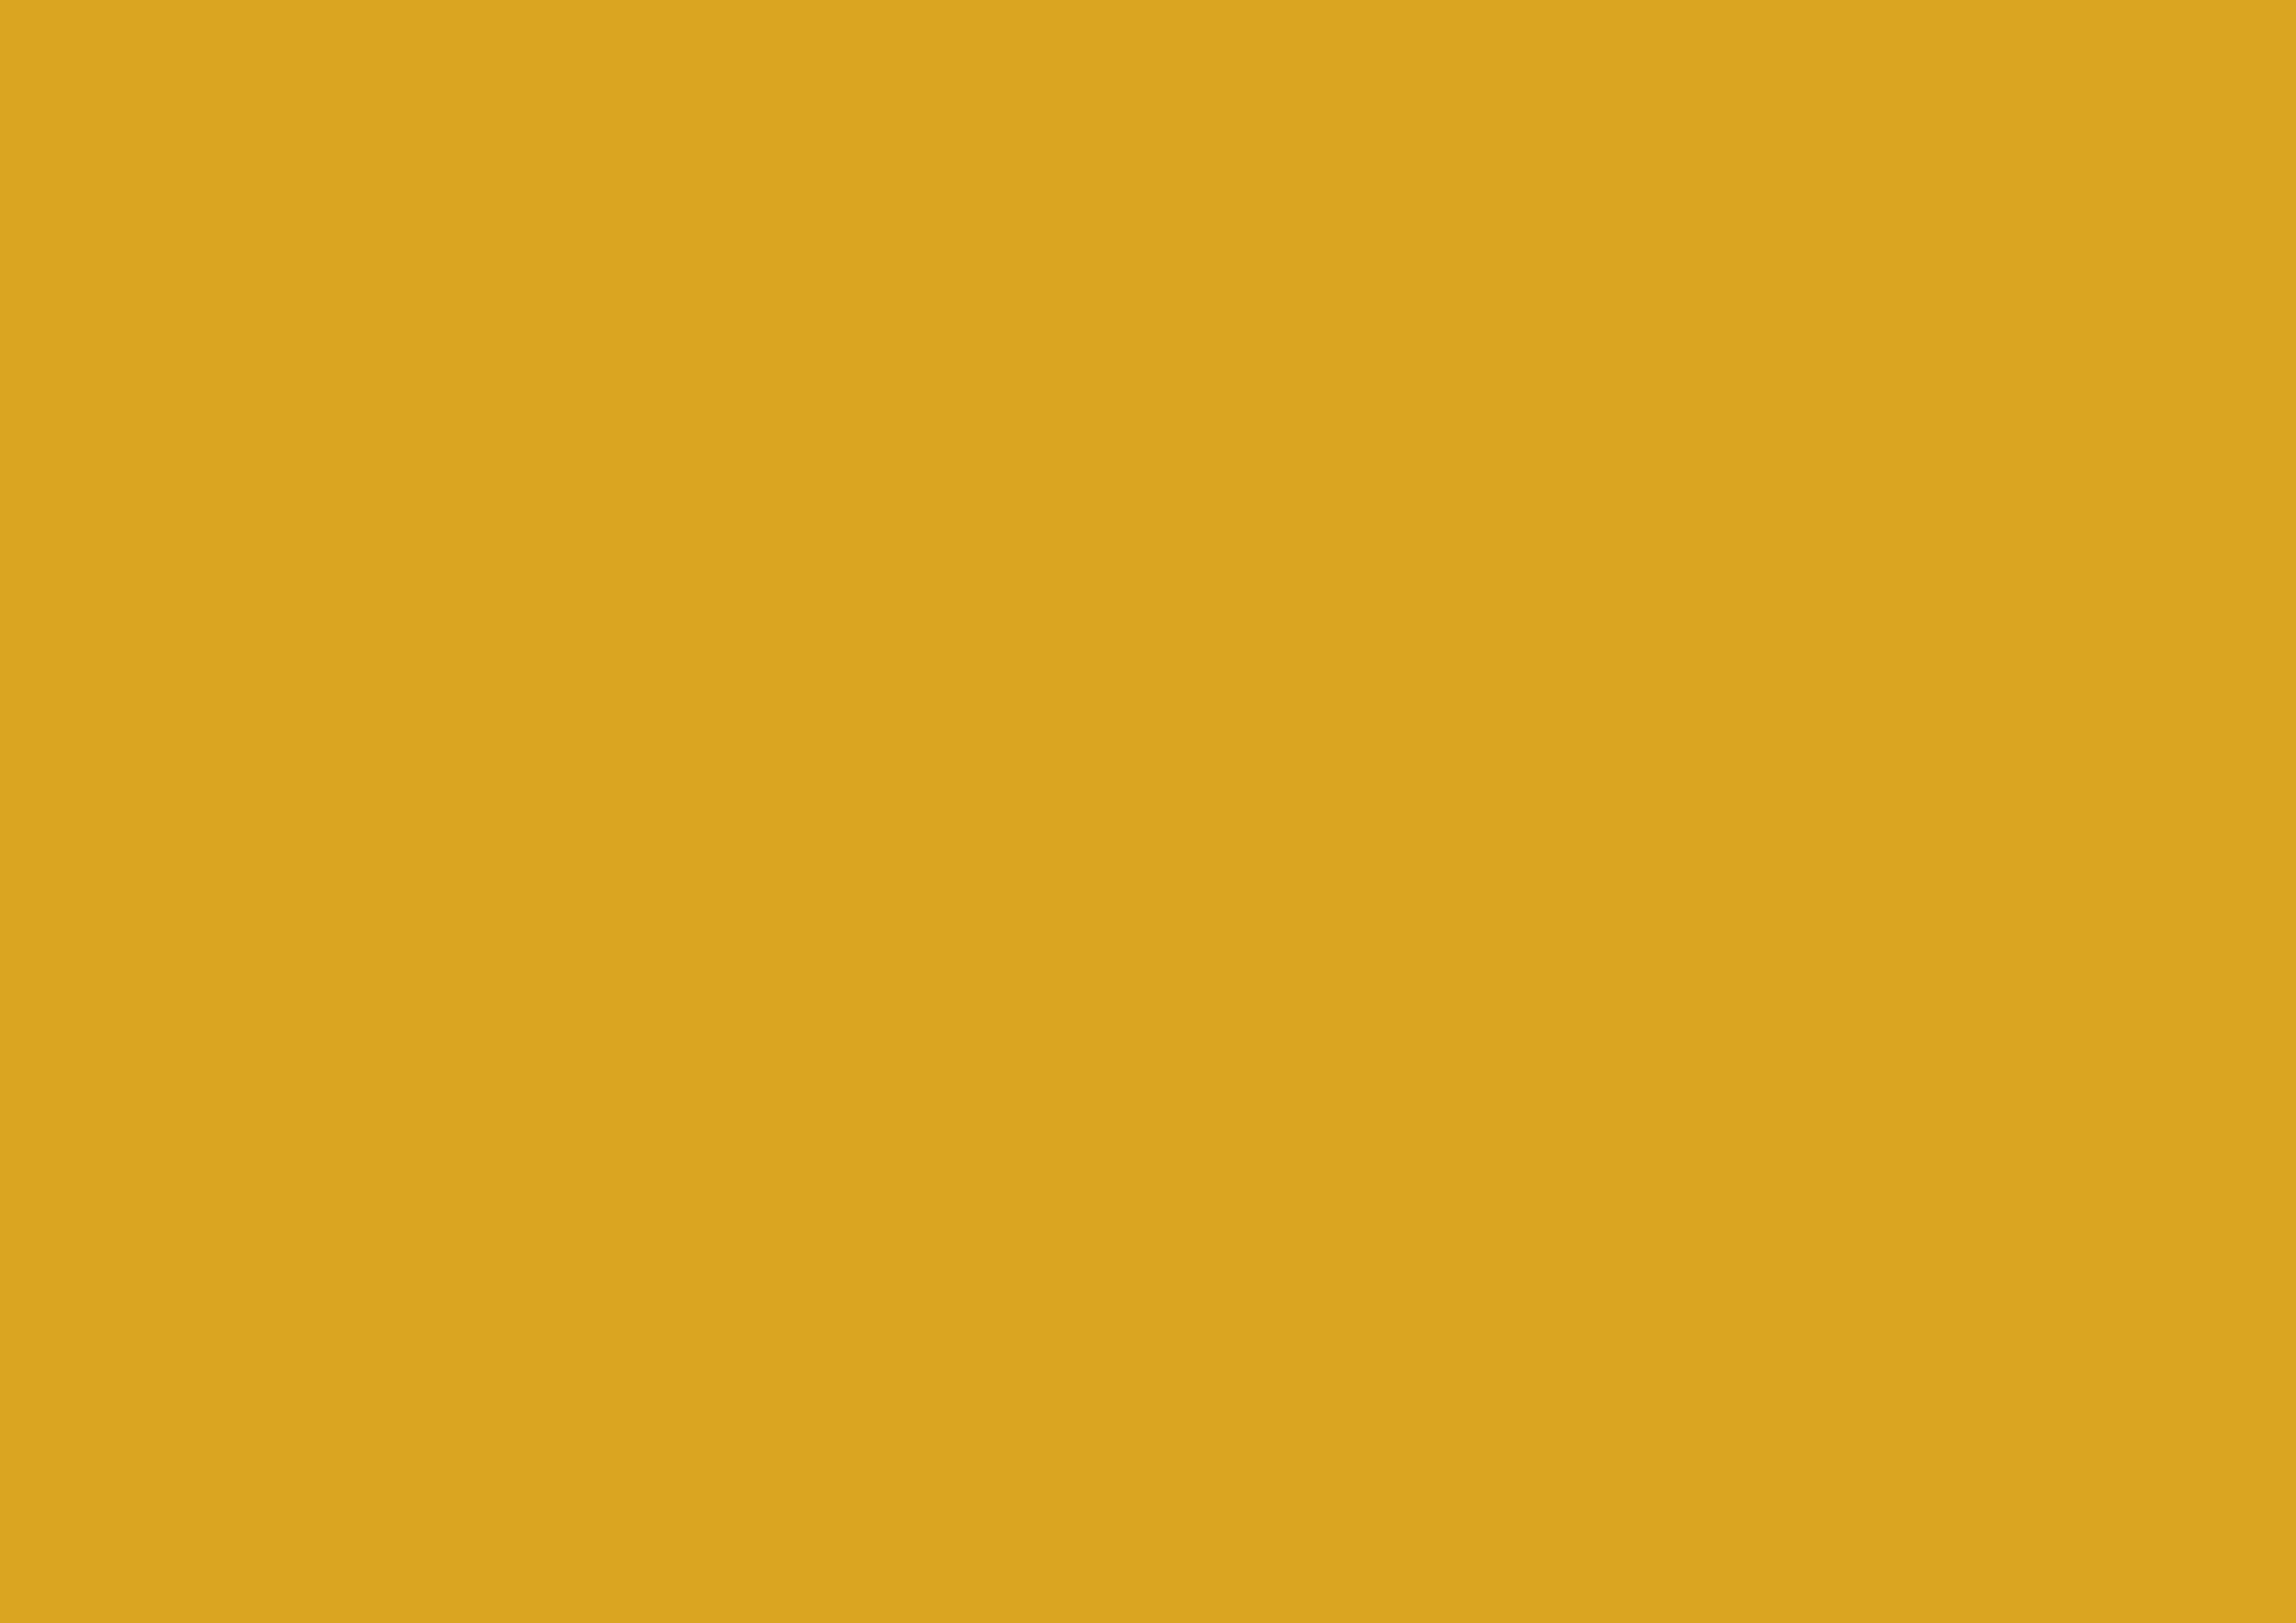 3508x2480 Goldenrod Solid Color Background